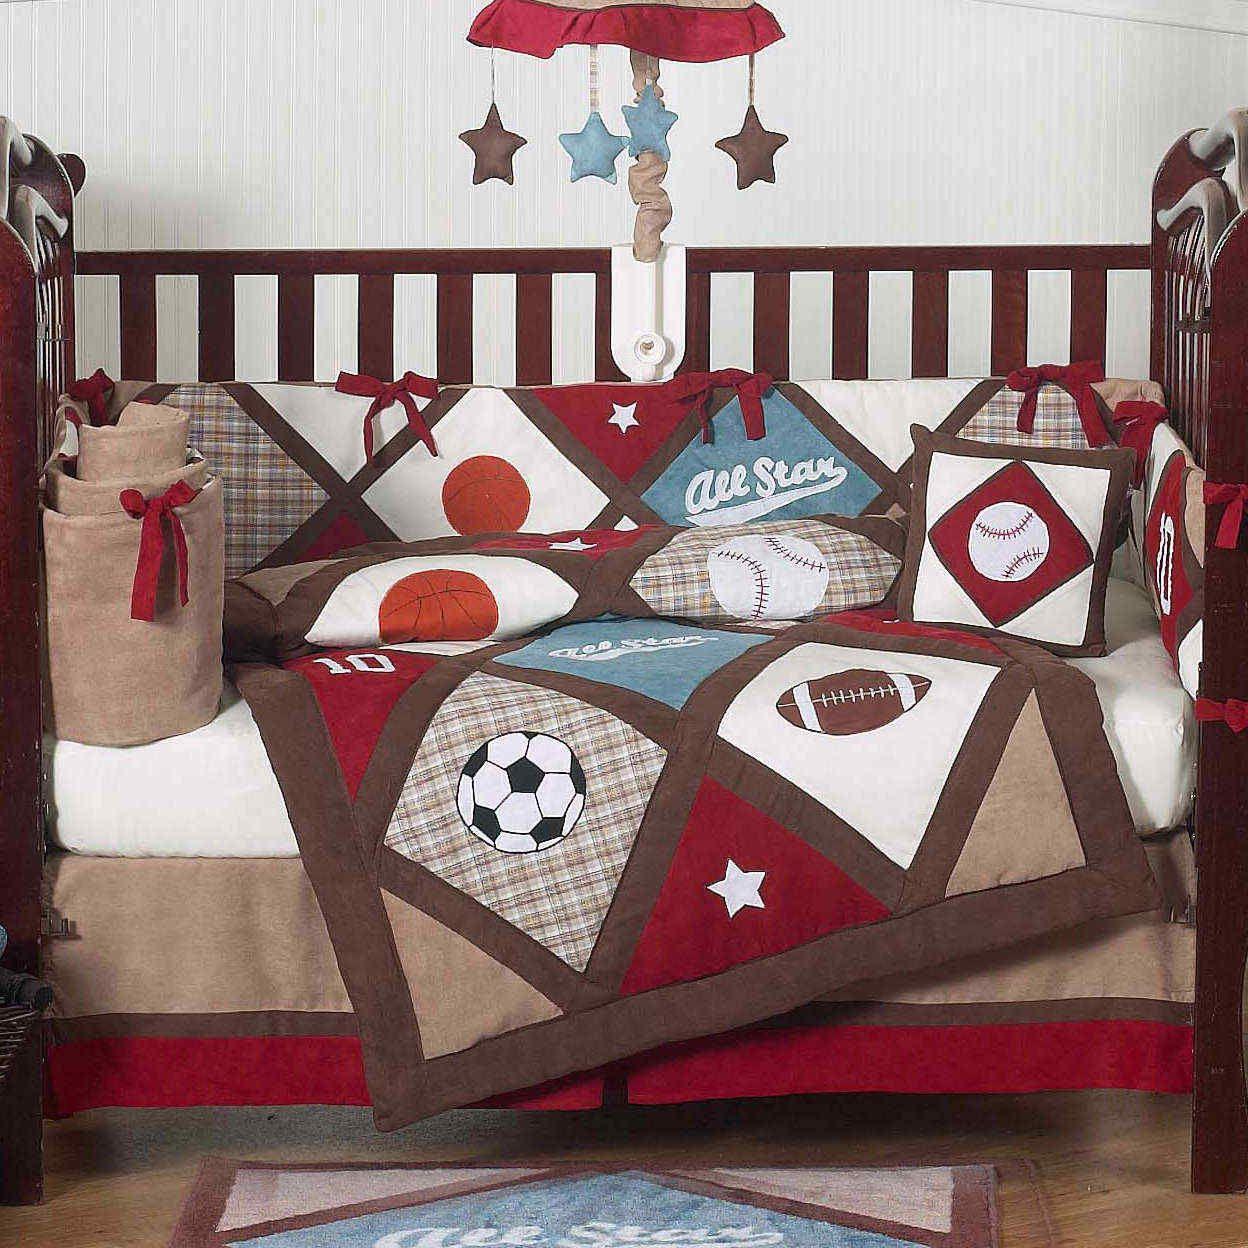 Kids sports bedding sets sports bedding sets for boys stars